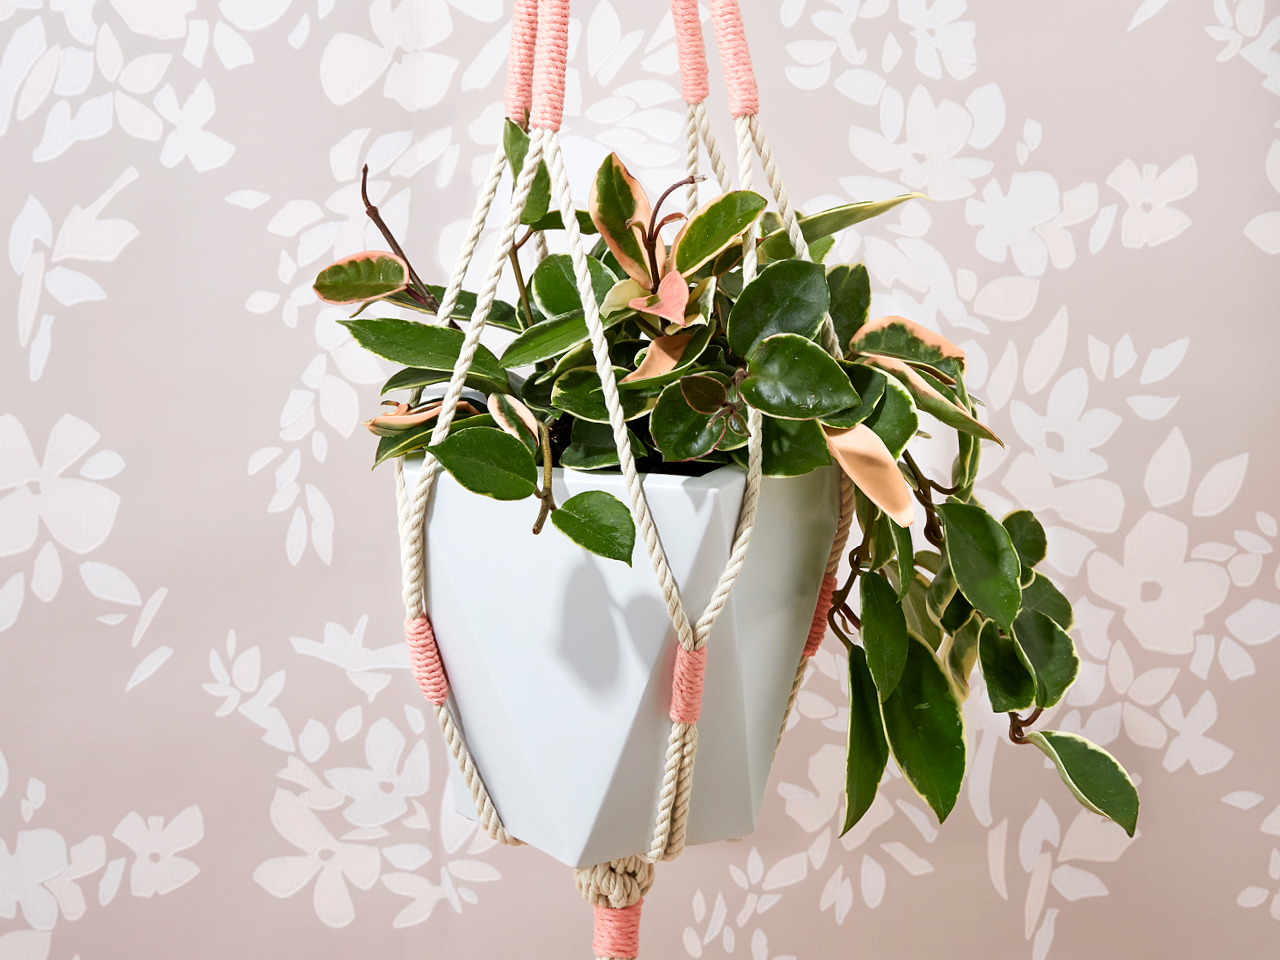 Hoya plant in a macramé hanging basket on a pink floral wallpaper background.